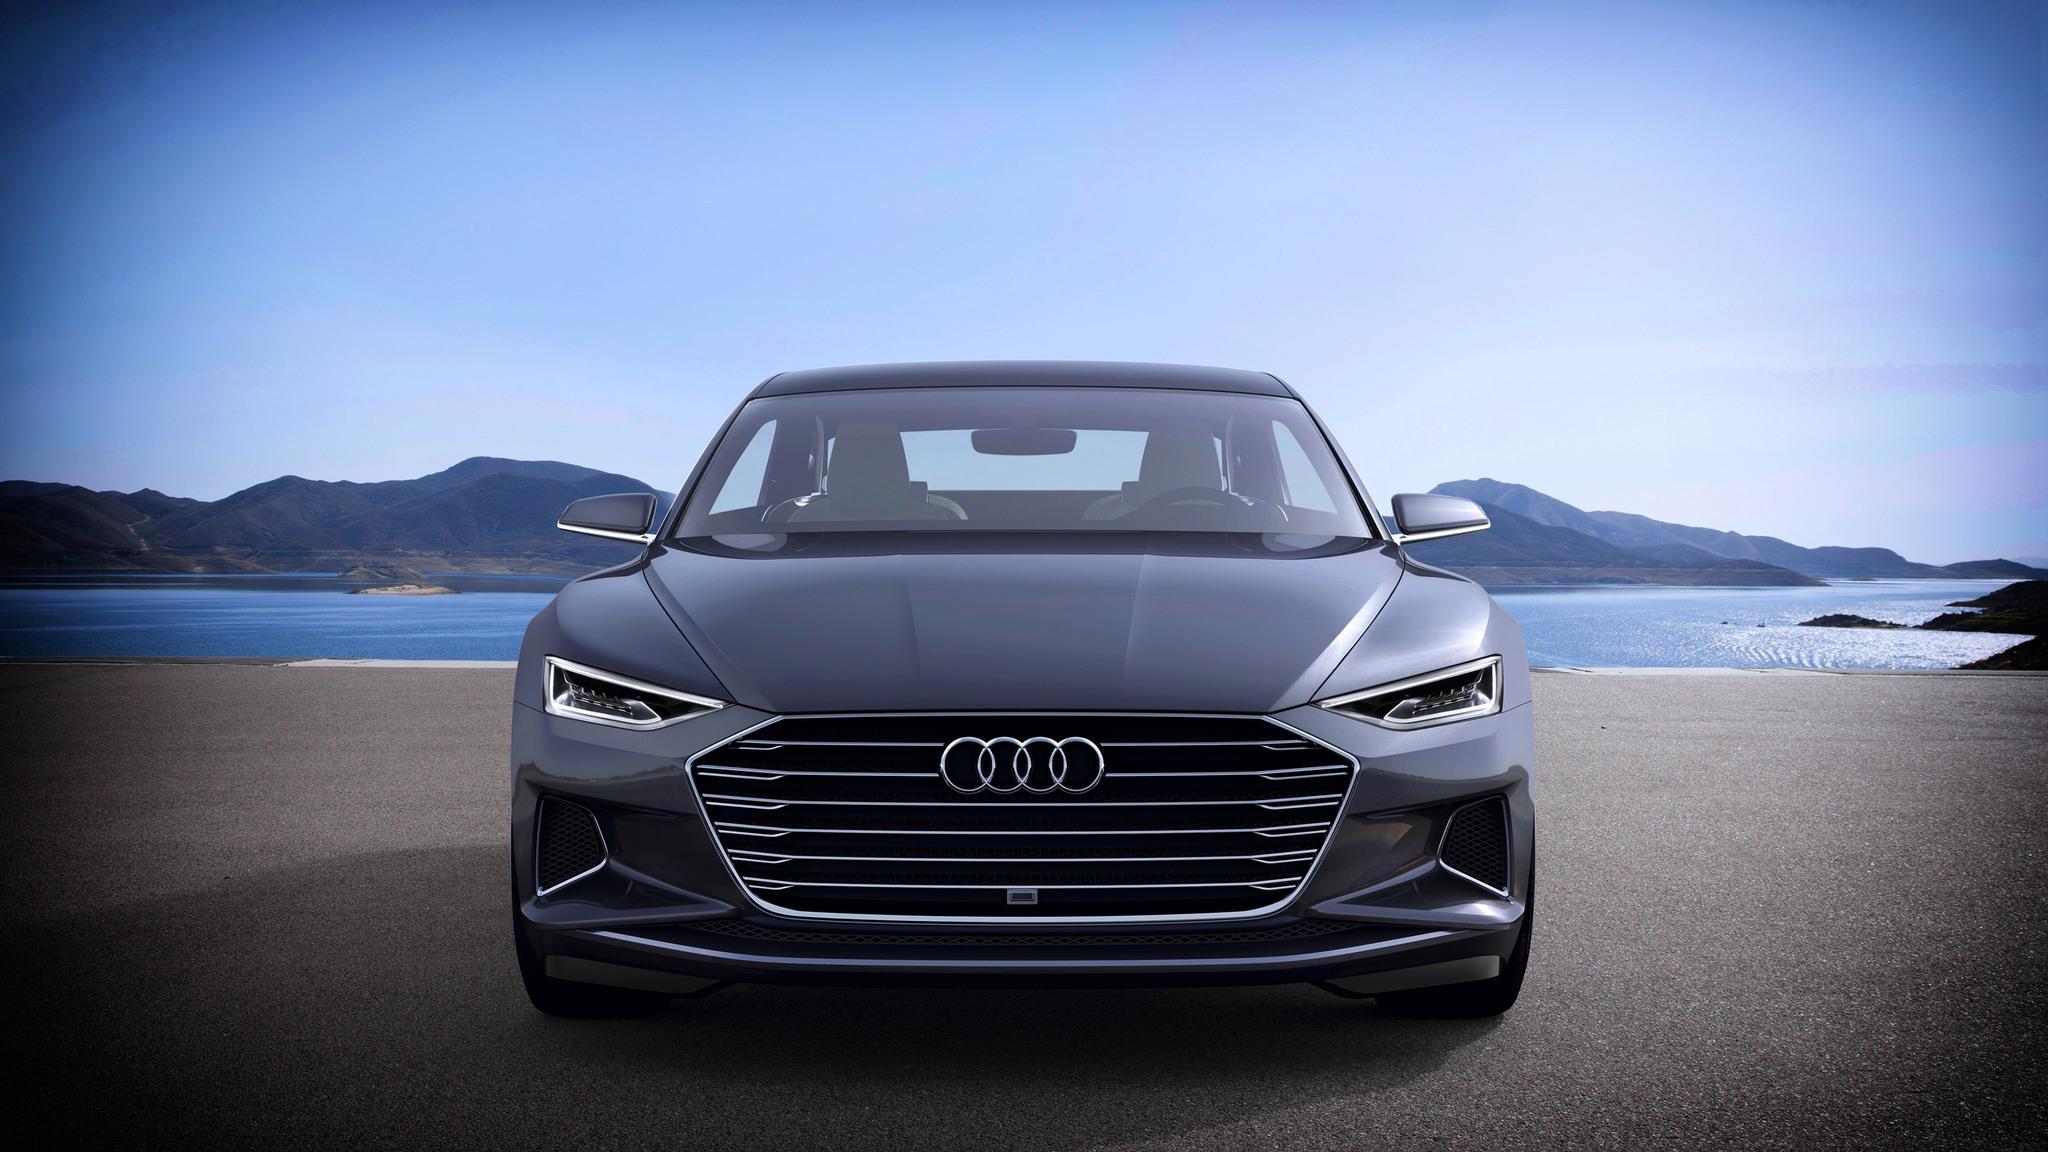 2048x1152 2016 Audi A9 Prologue 2048x1152 Resolution HD 4k